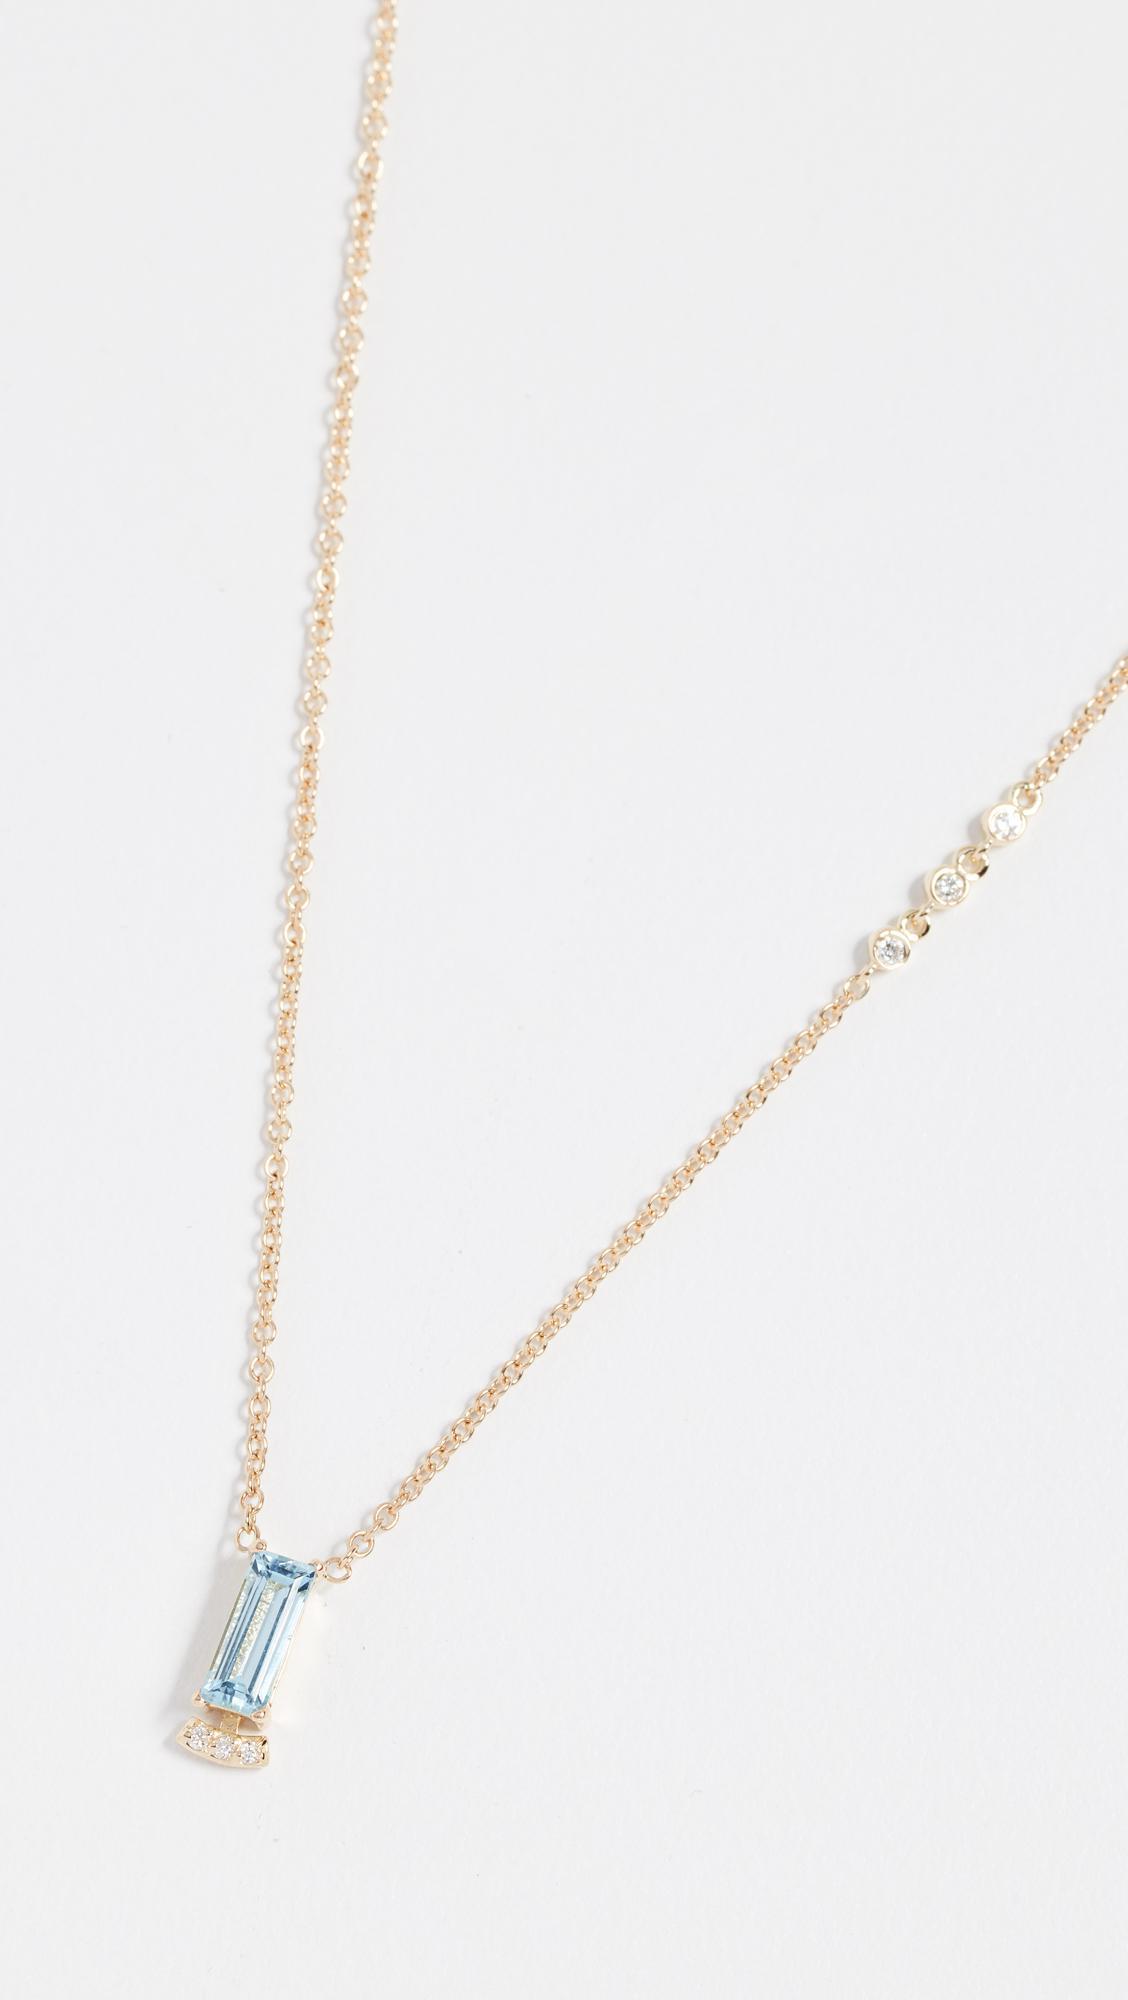 Paige Novick 18k Necklace with Baguette Gemstone & Pave Diamond Bar anzux8t6E